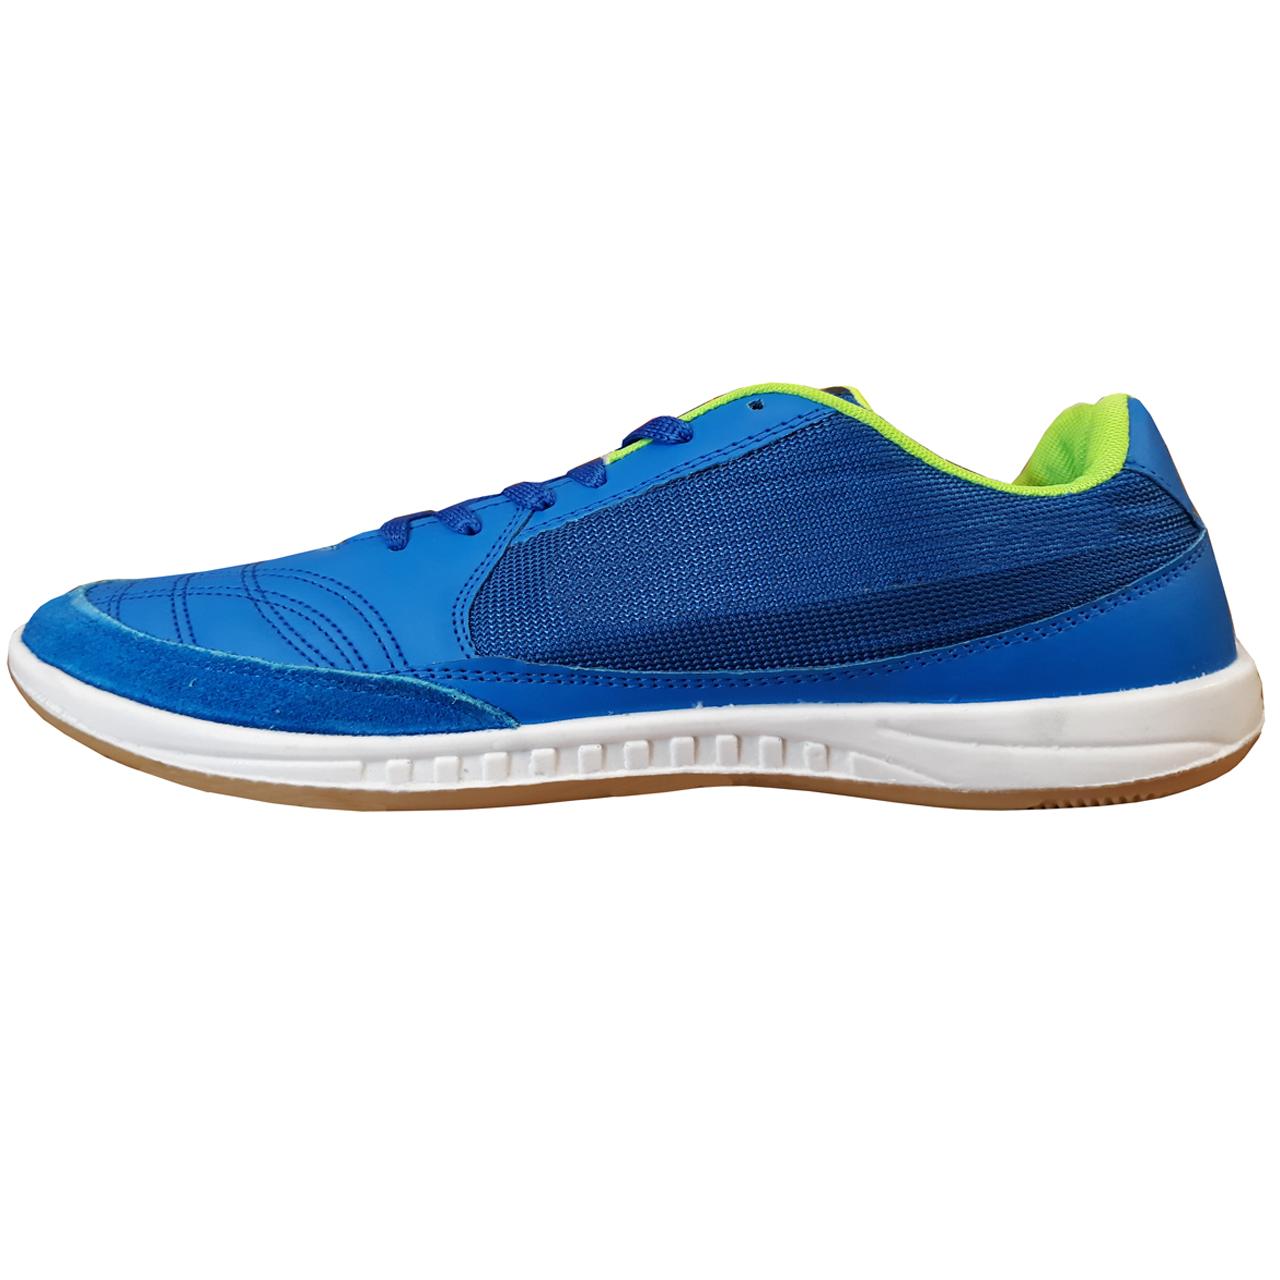 قیمت کفش فوتسال مردانه مدل d900